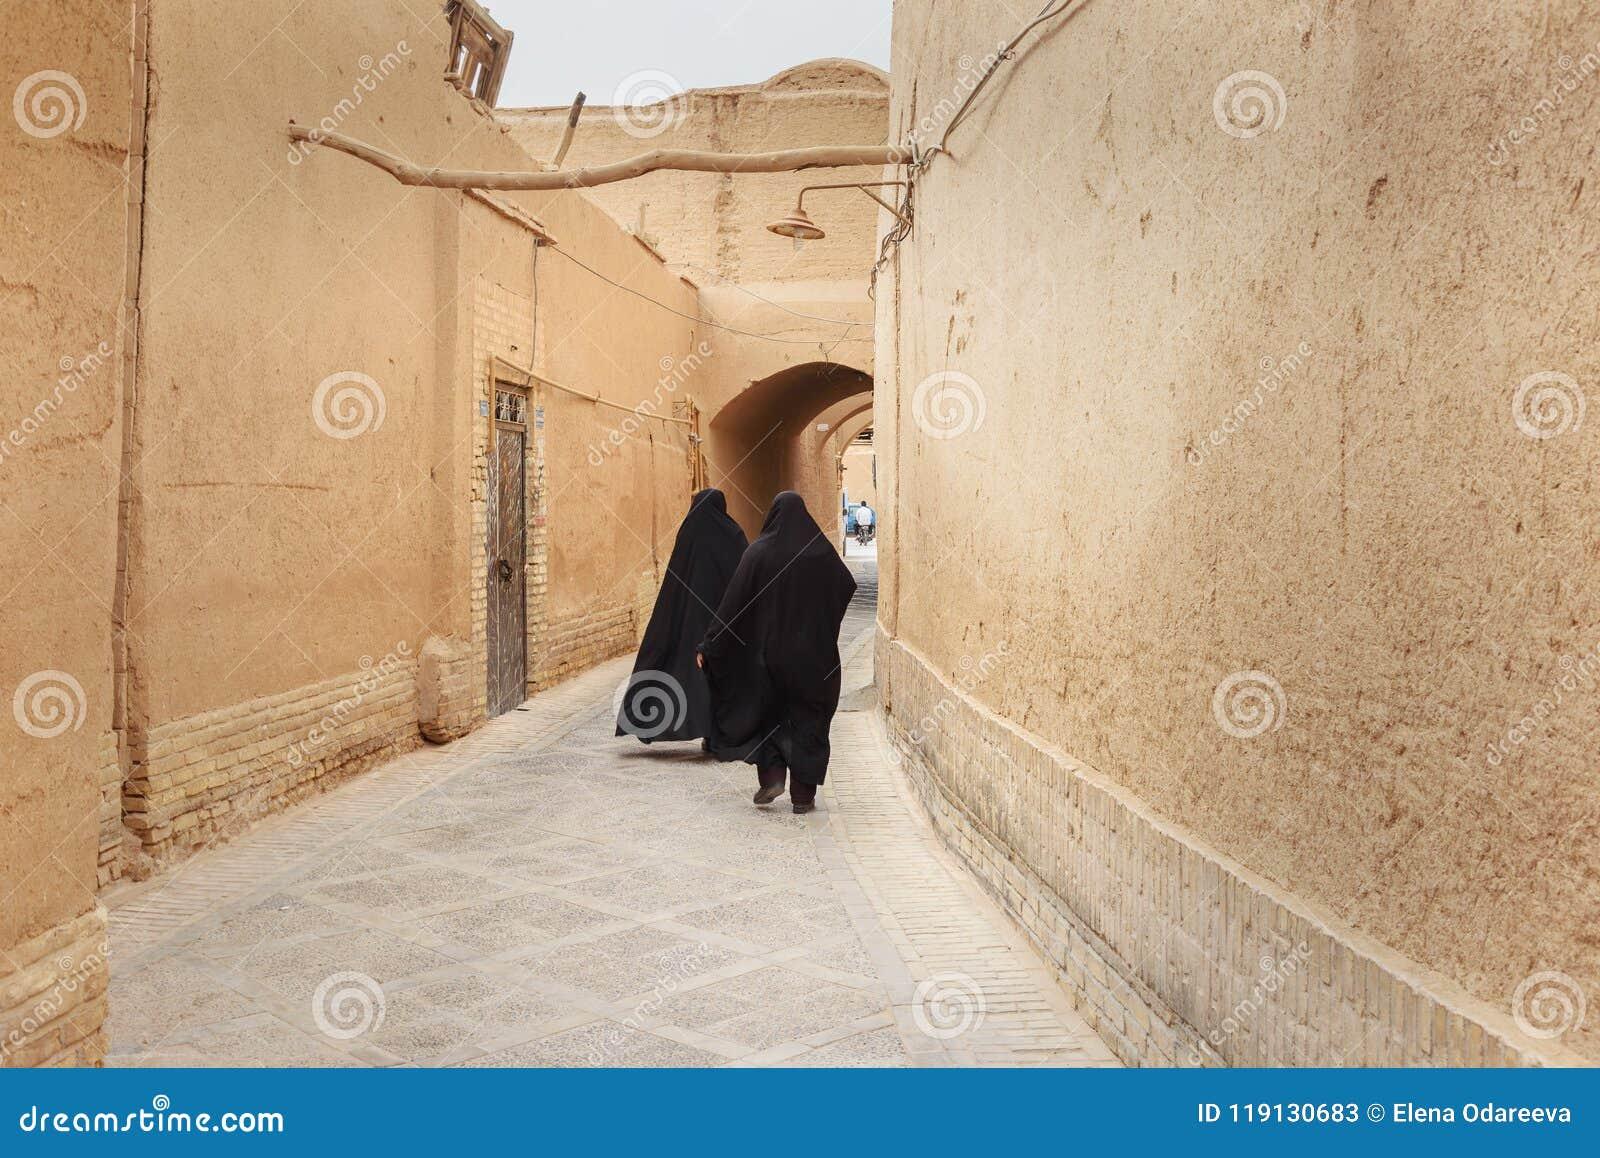 Two Muslim women, dressed in black chador walk on the narrow street of old town in Yazd. Iran